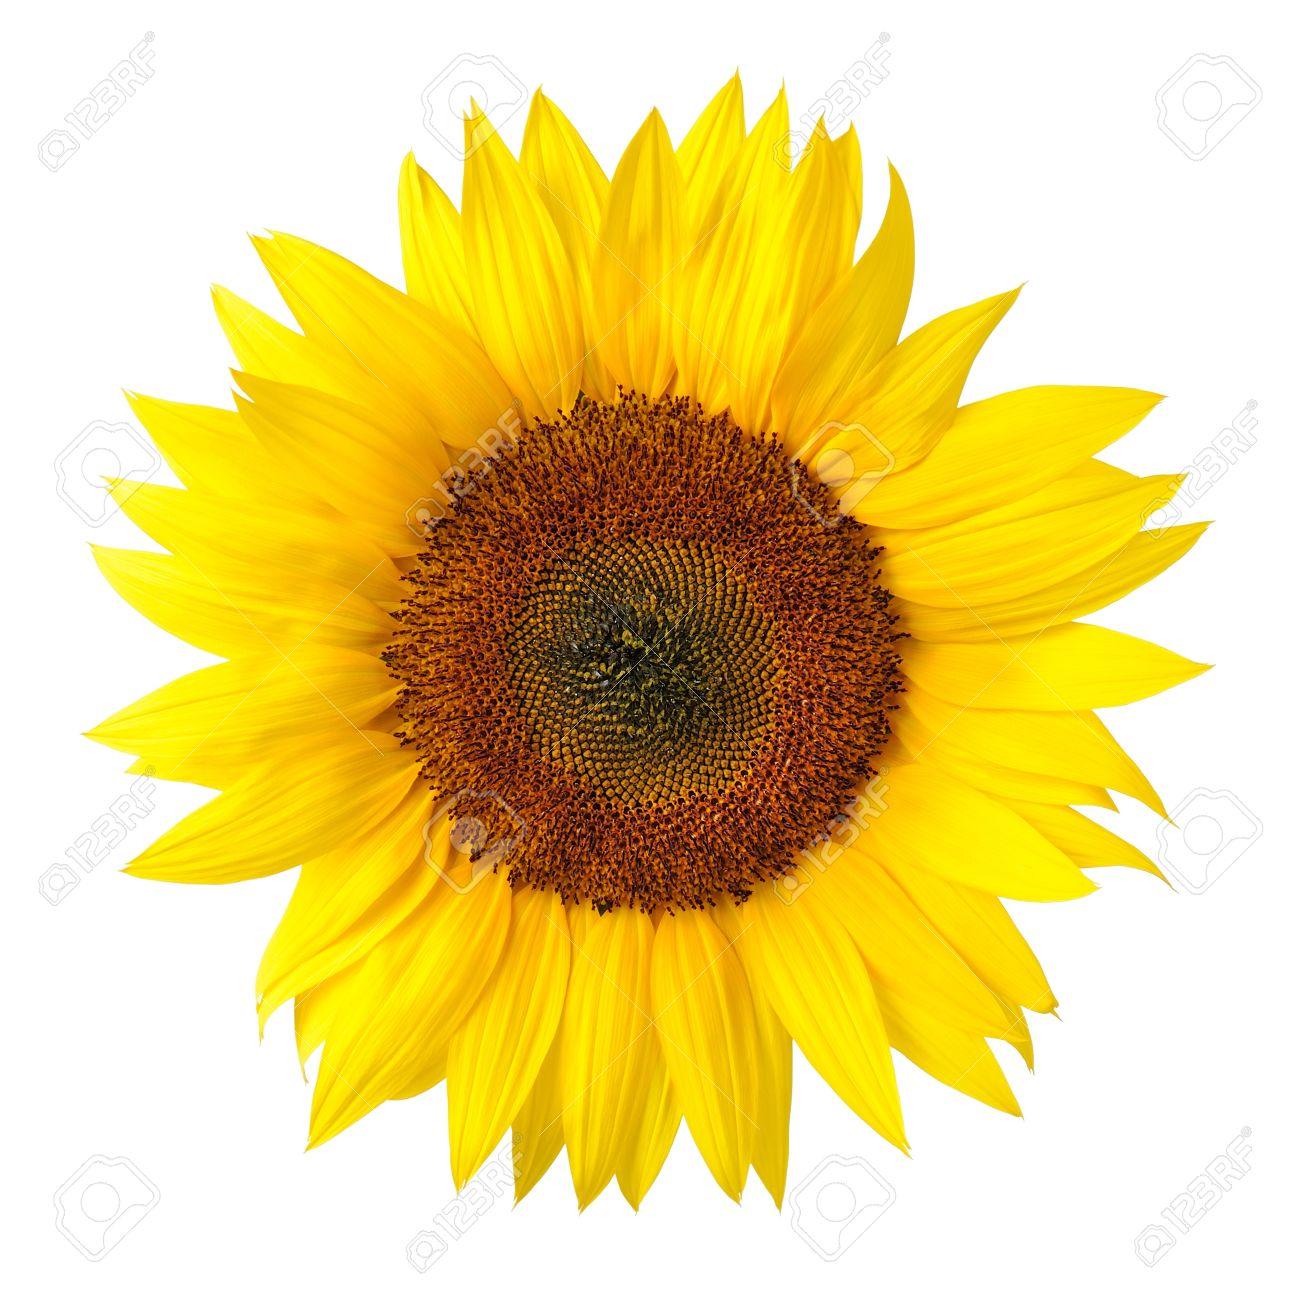 Bright Studio Shot Of A Large Beautiful Sunflower On White Background